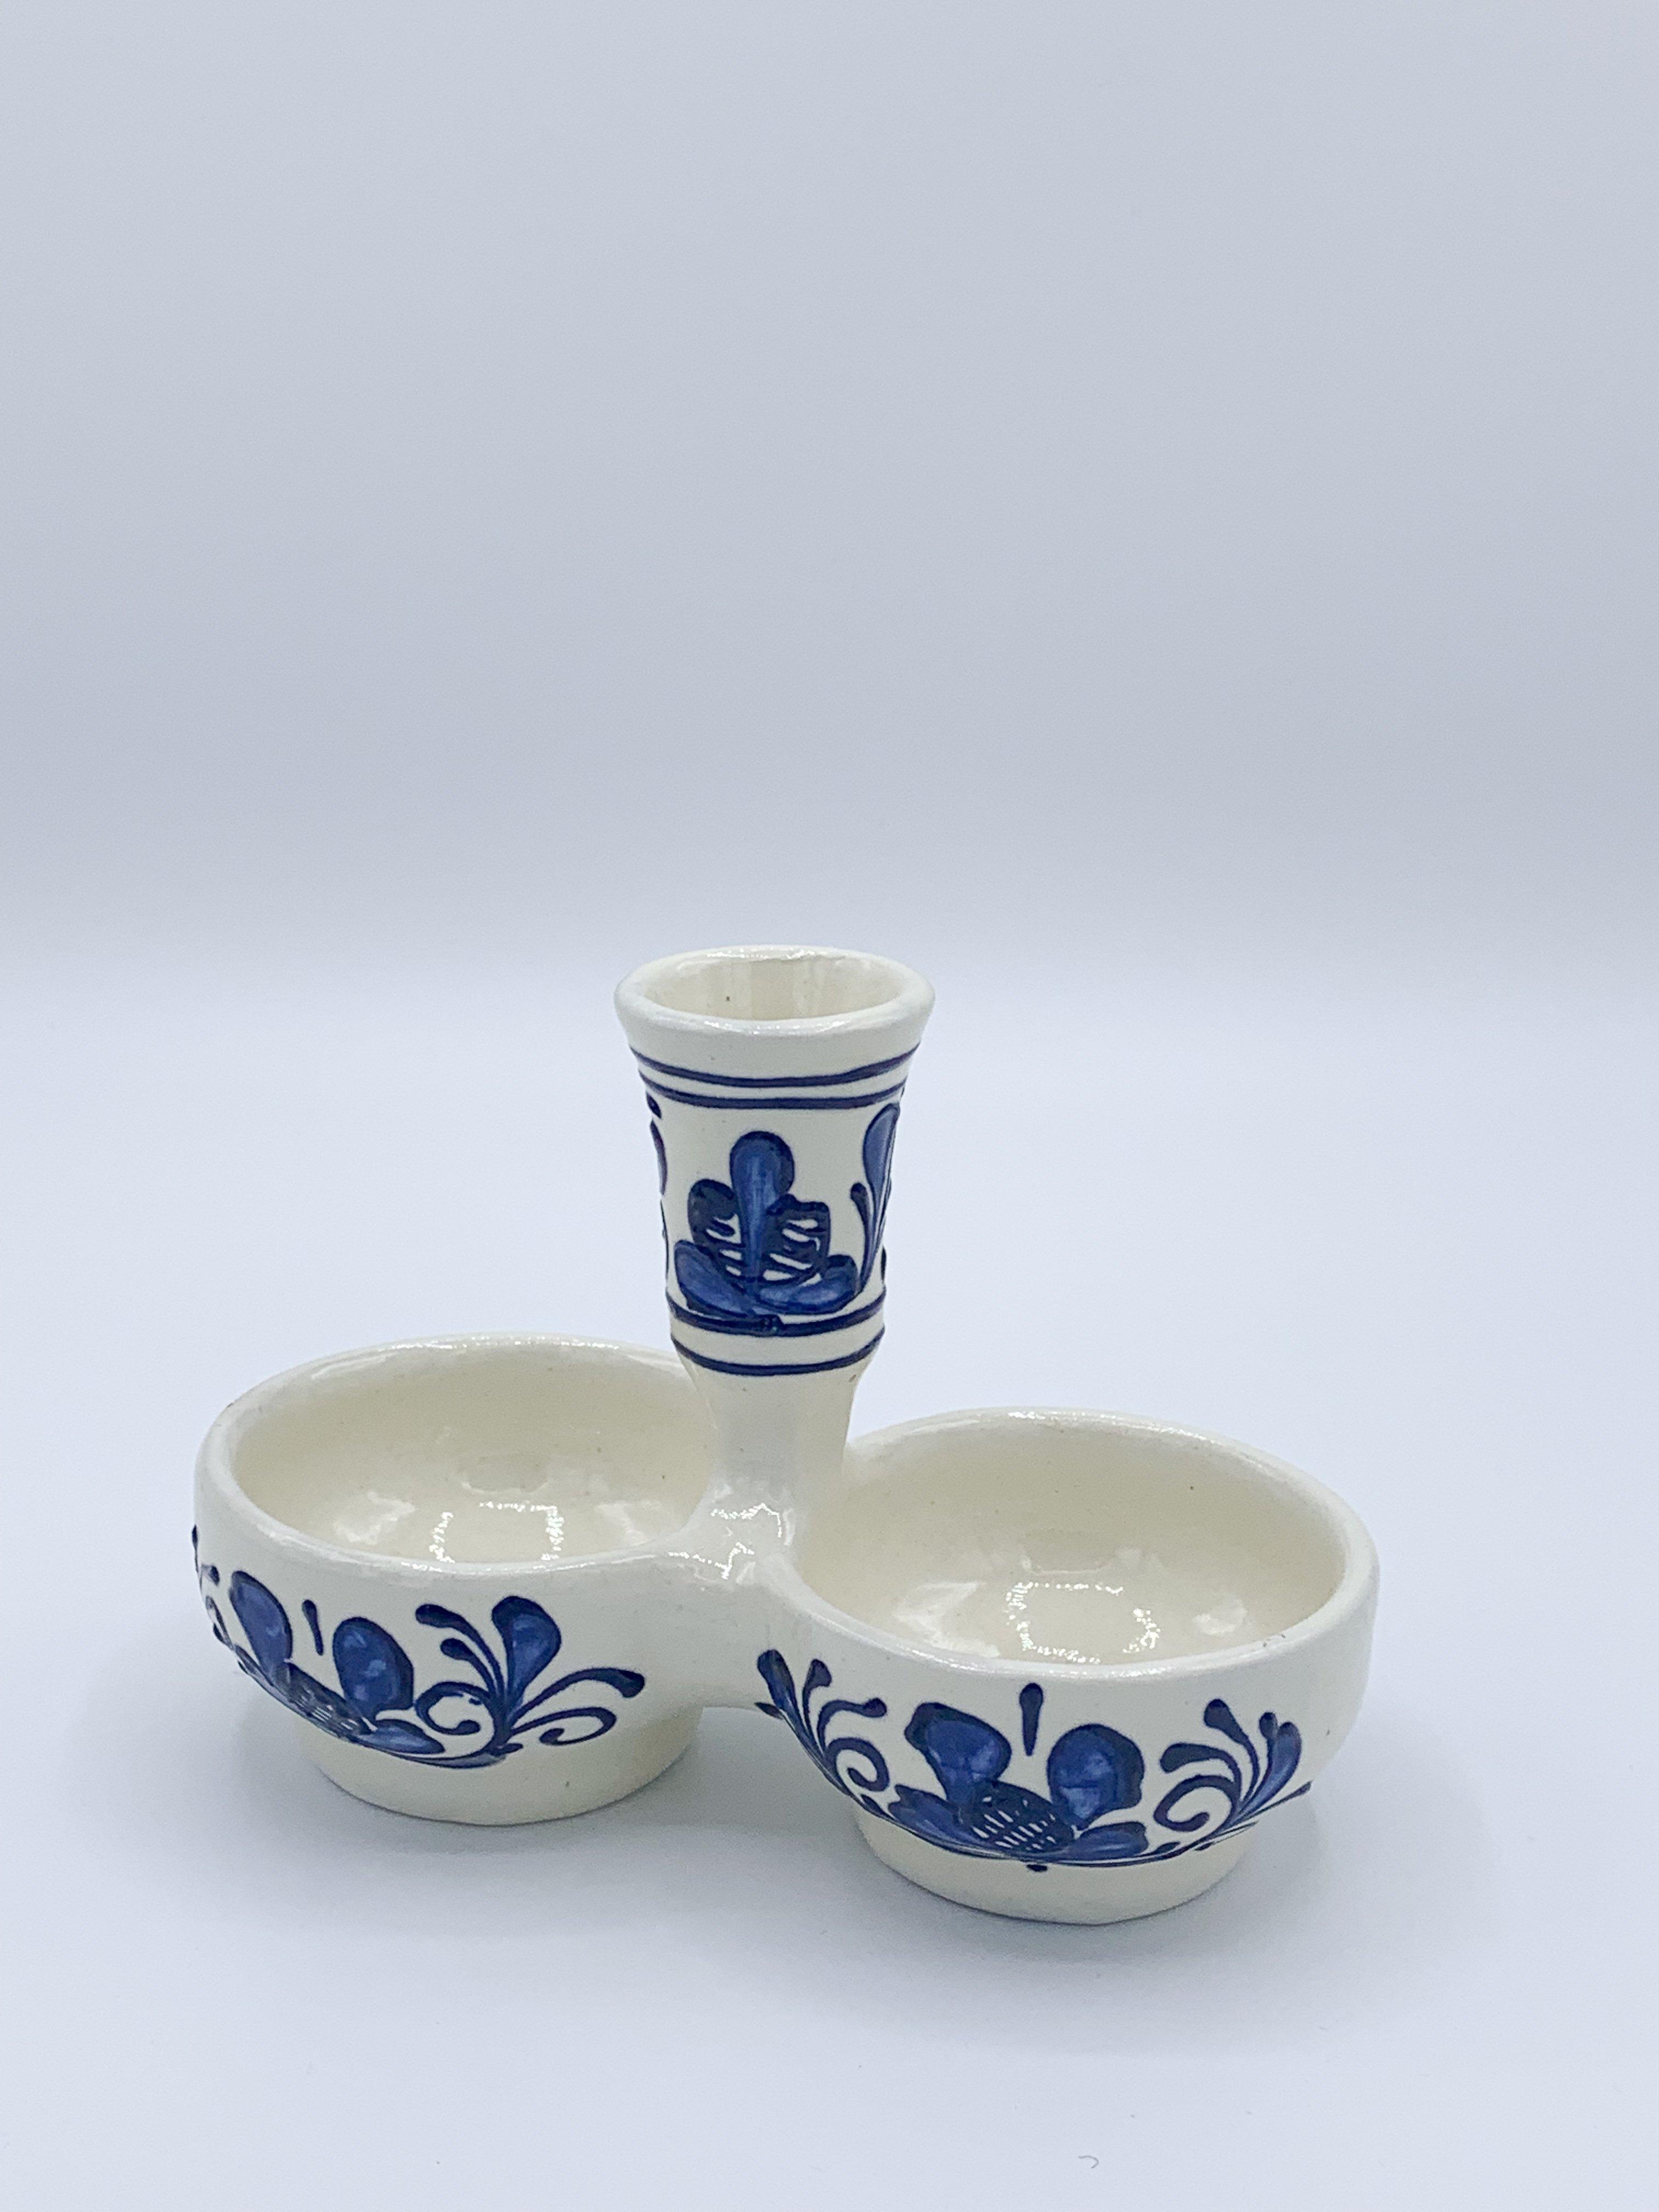 Solnita din ceramica de corund [2]